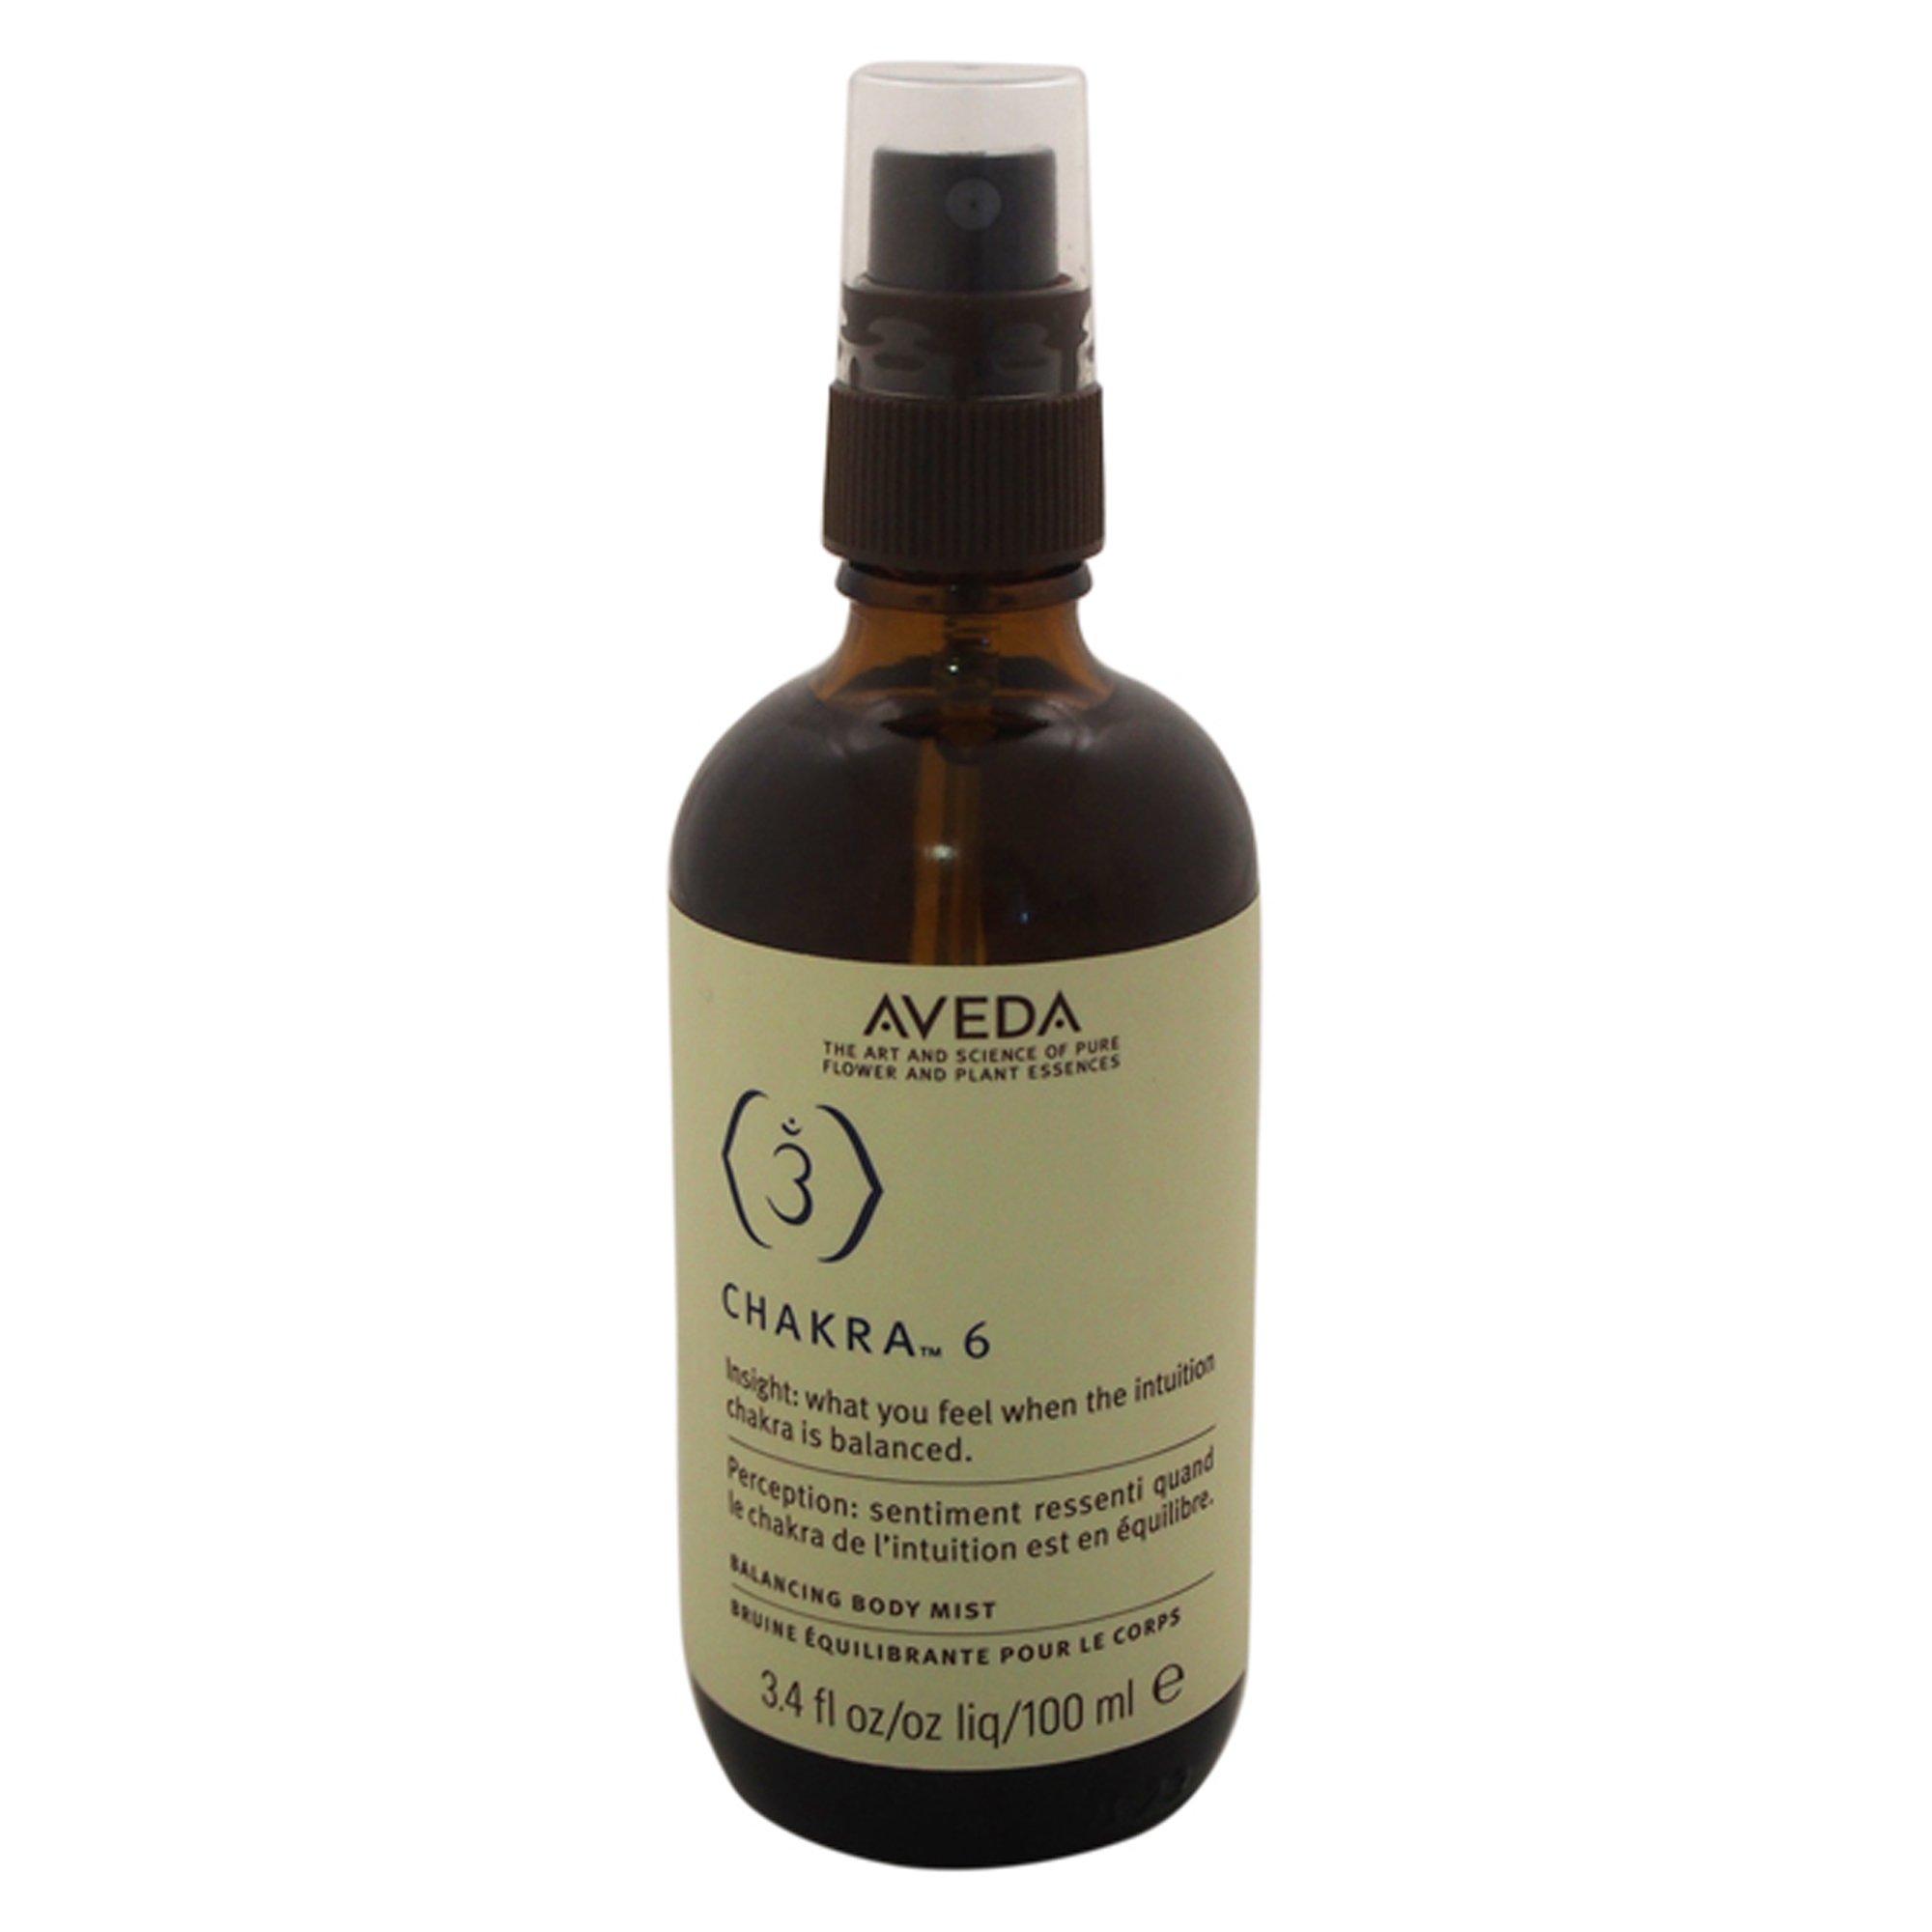 Aveda Chakra 6 Balancing Body Mist, 3.4 Ounce by AVEDA